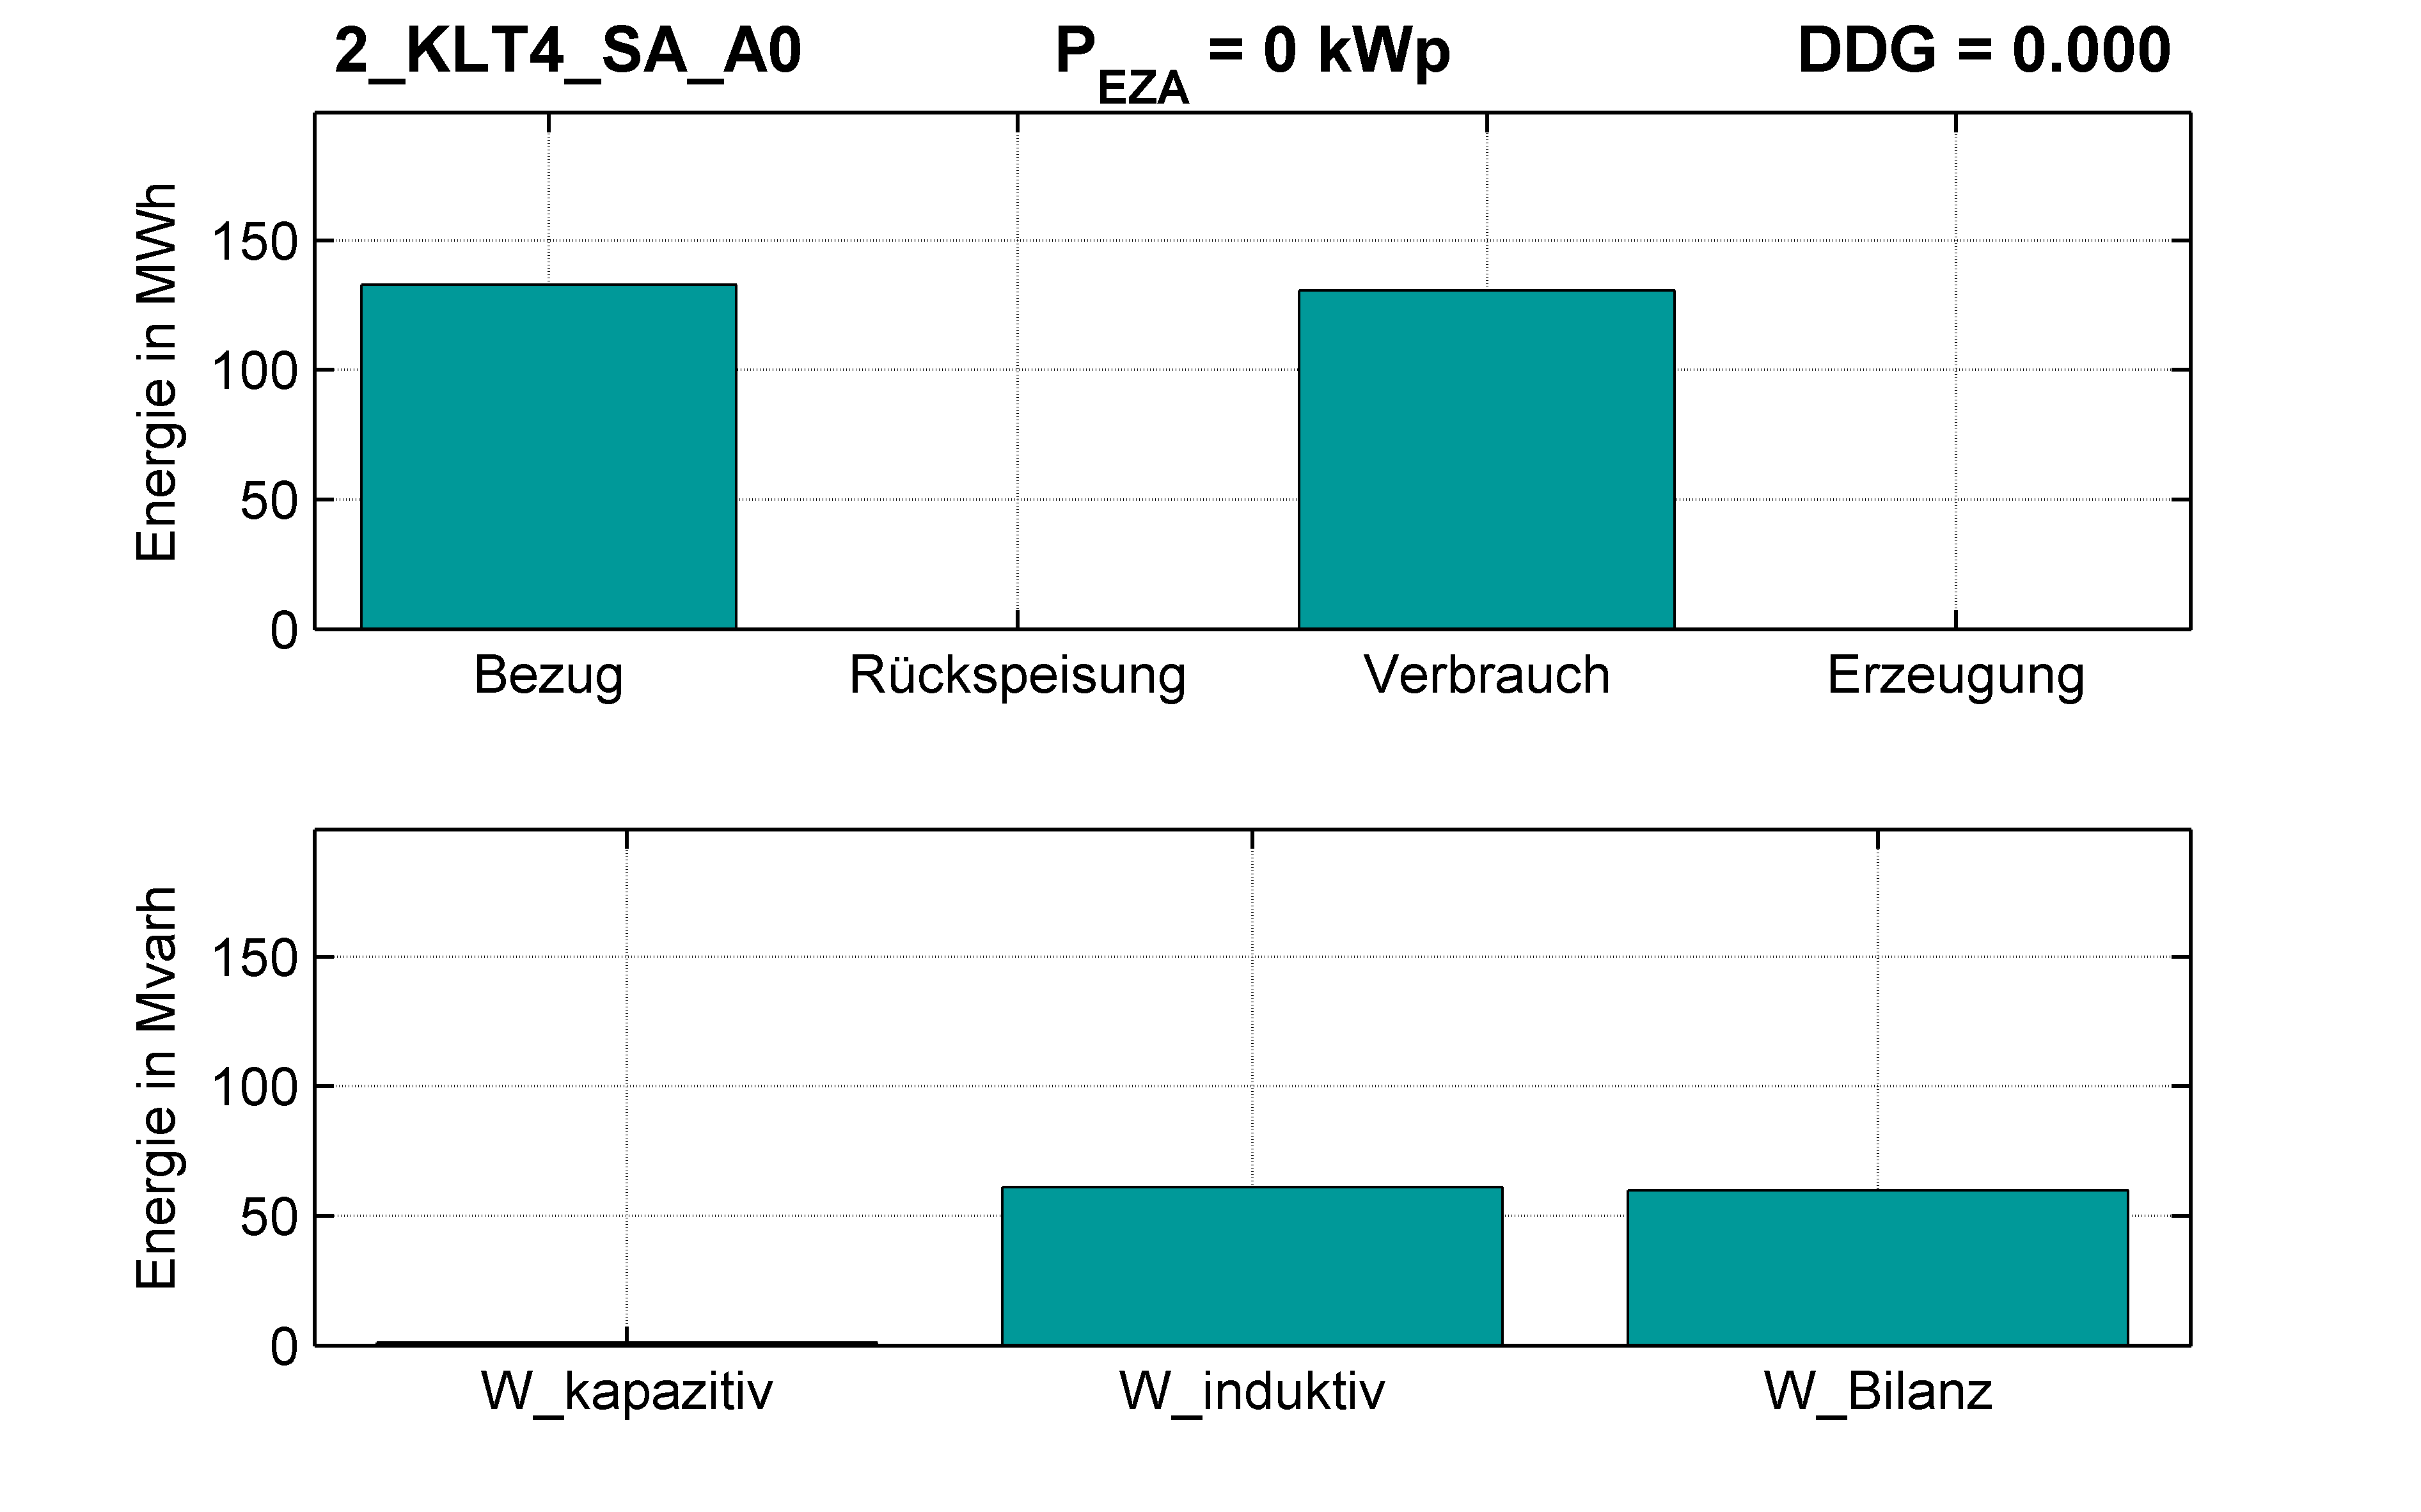 KLT4 | P-Kappung 85% (SA) A0 | PQ-Bilanz